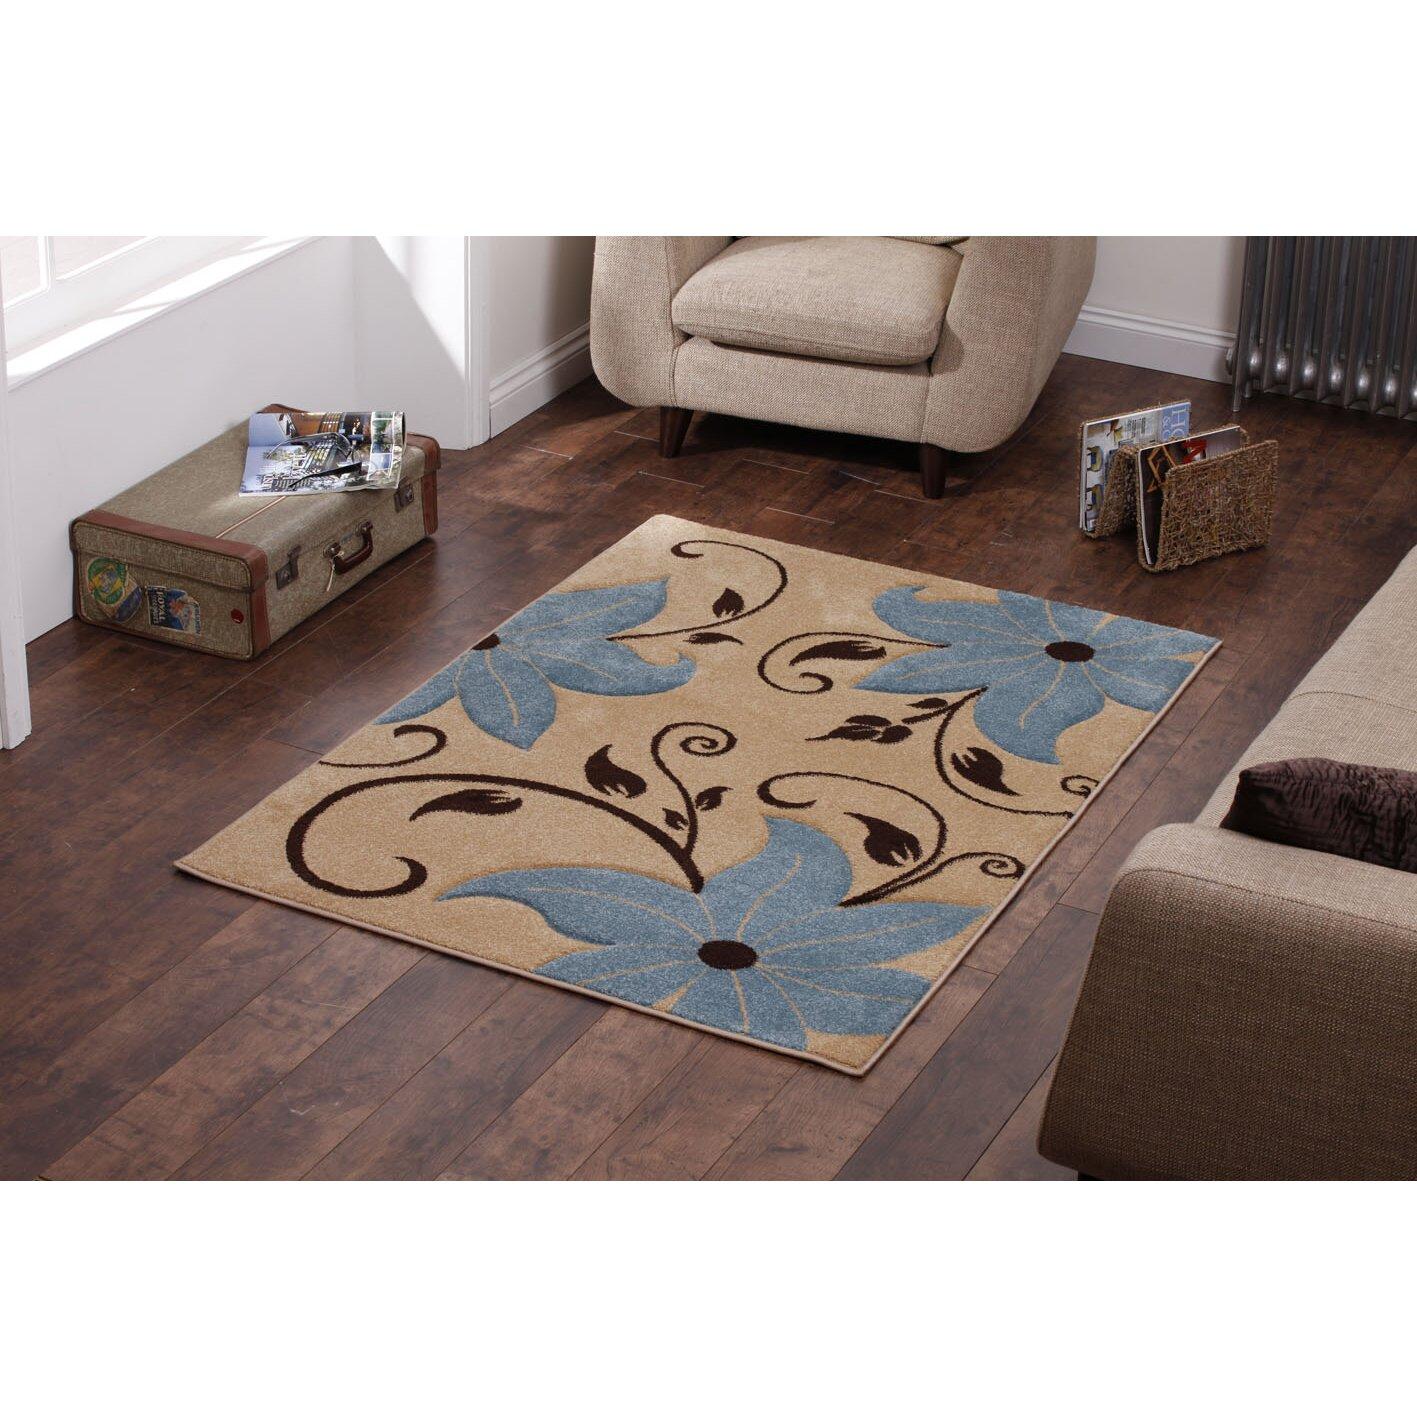 wayfair basics beige blue area rug reviews wayfair uk. Black Bedroom Furniture Sets. Home Design Ideas